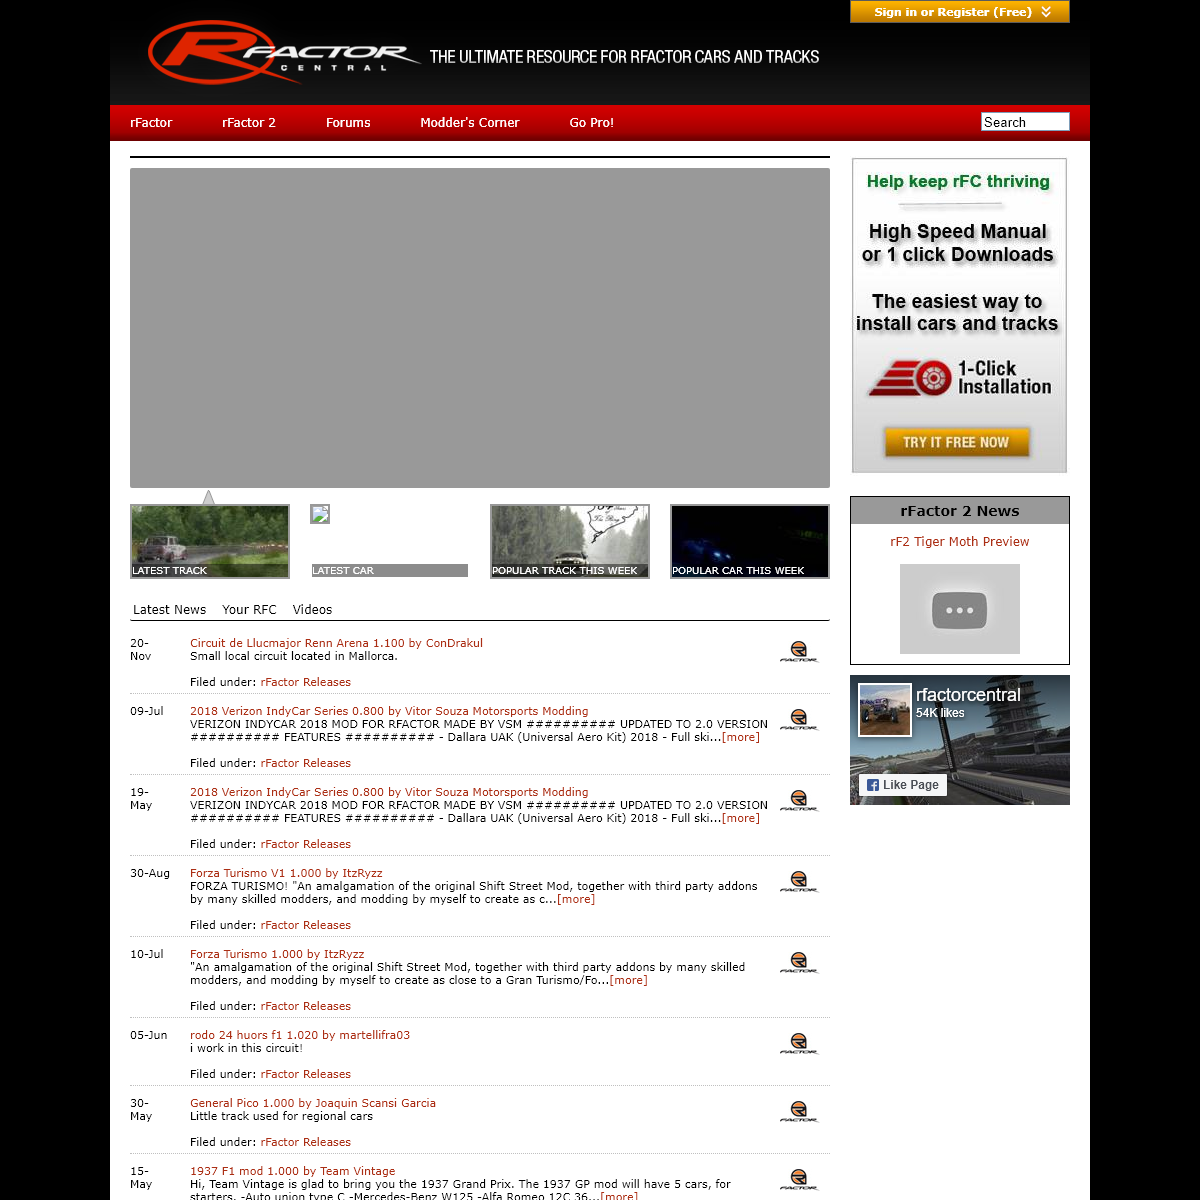 rFactor Central - Community Driven Sim Racing Resource for rFactor - rFactor Car mods, rFactor Tracks, Car Setups, rFactor Scree